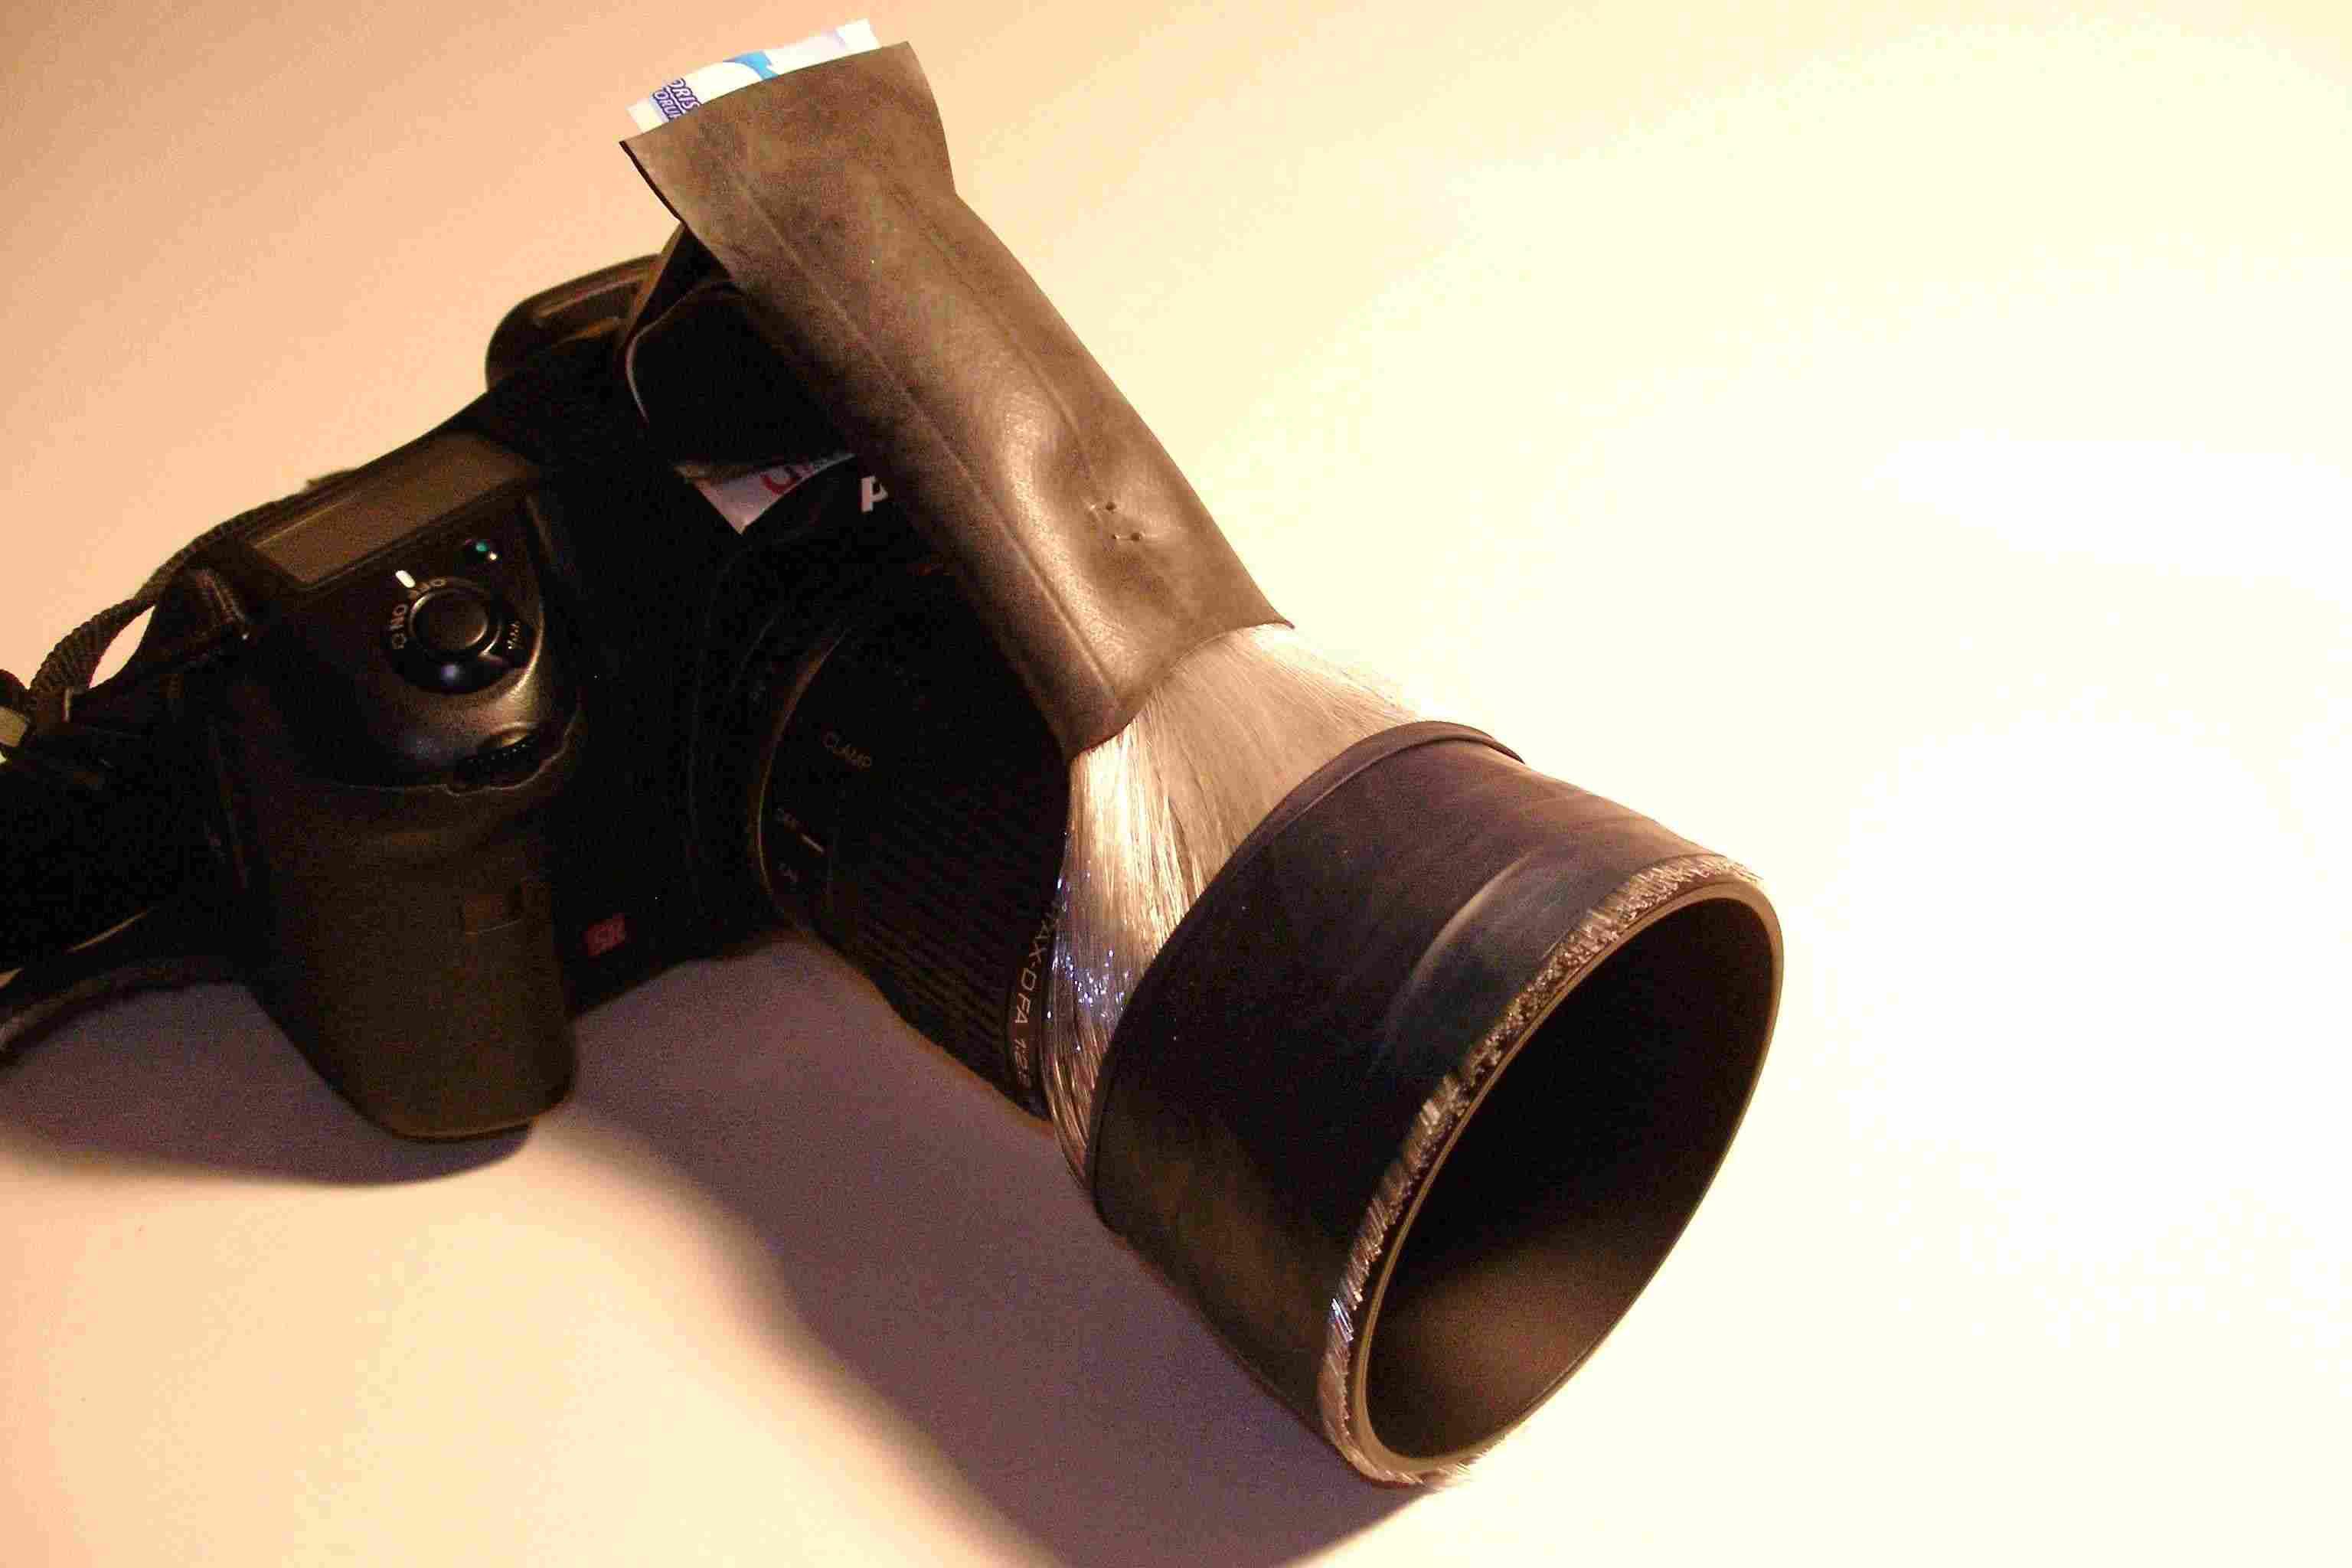 DIY ring-flash for your DSLR